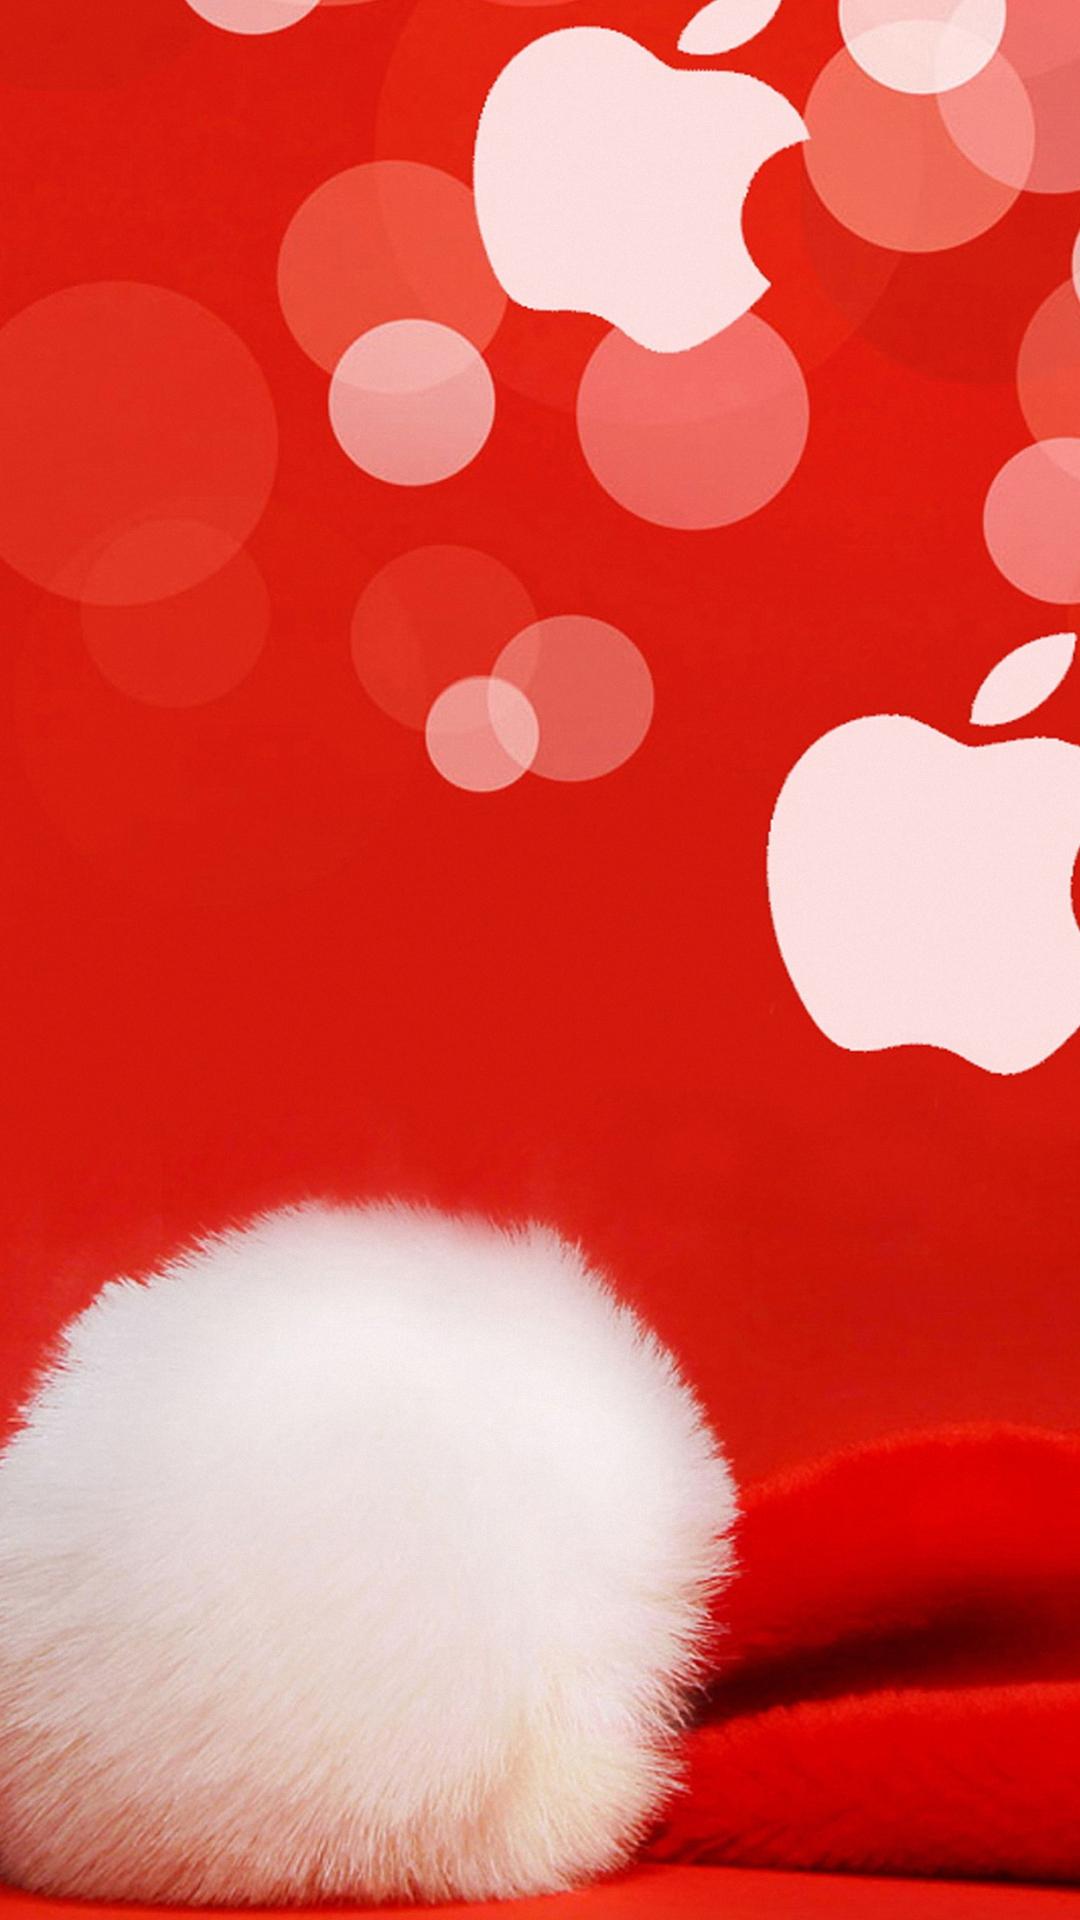 iphone 6s wallpaper HD 1784no6fa 1080x1920jpg 1080x1920